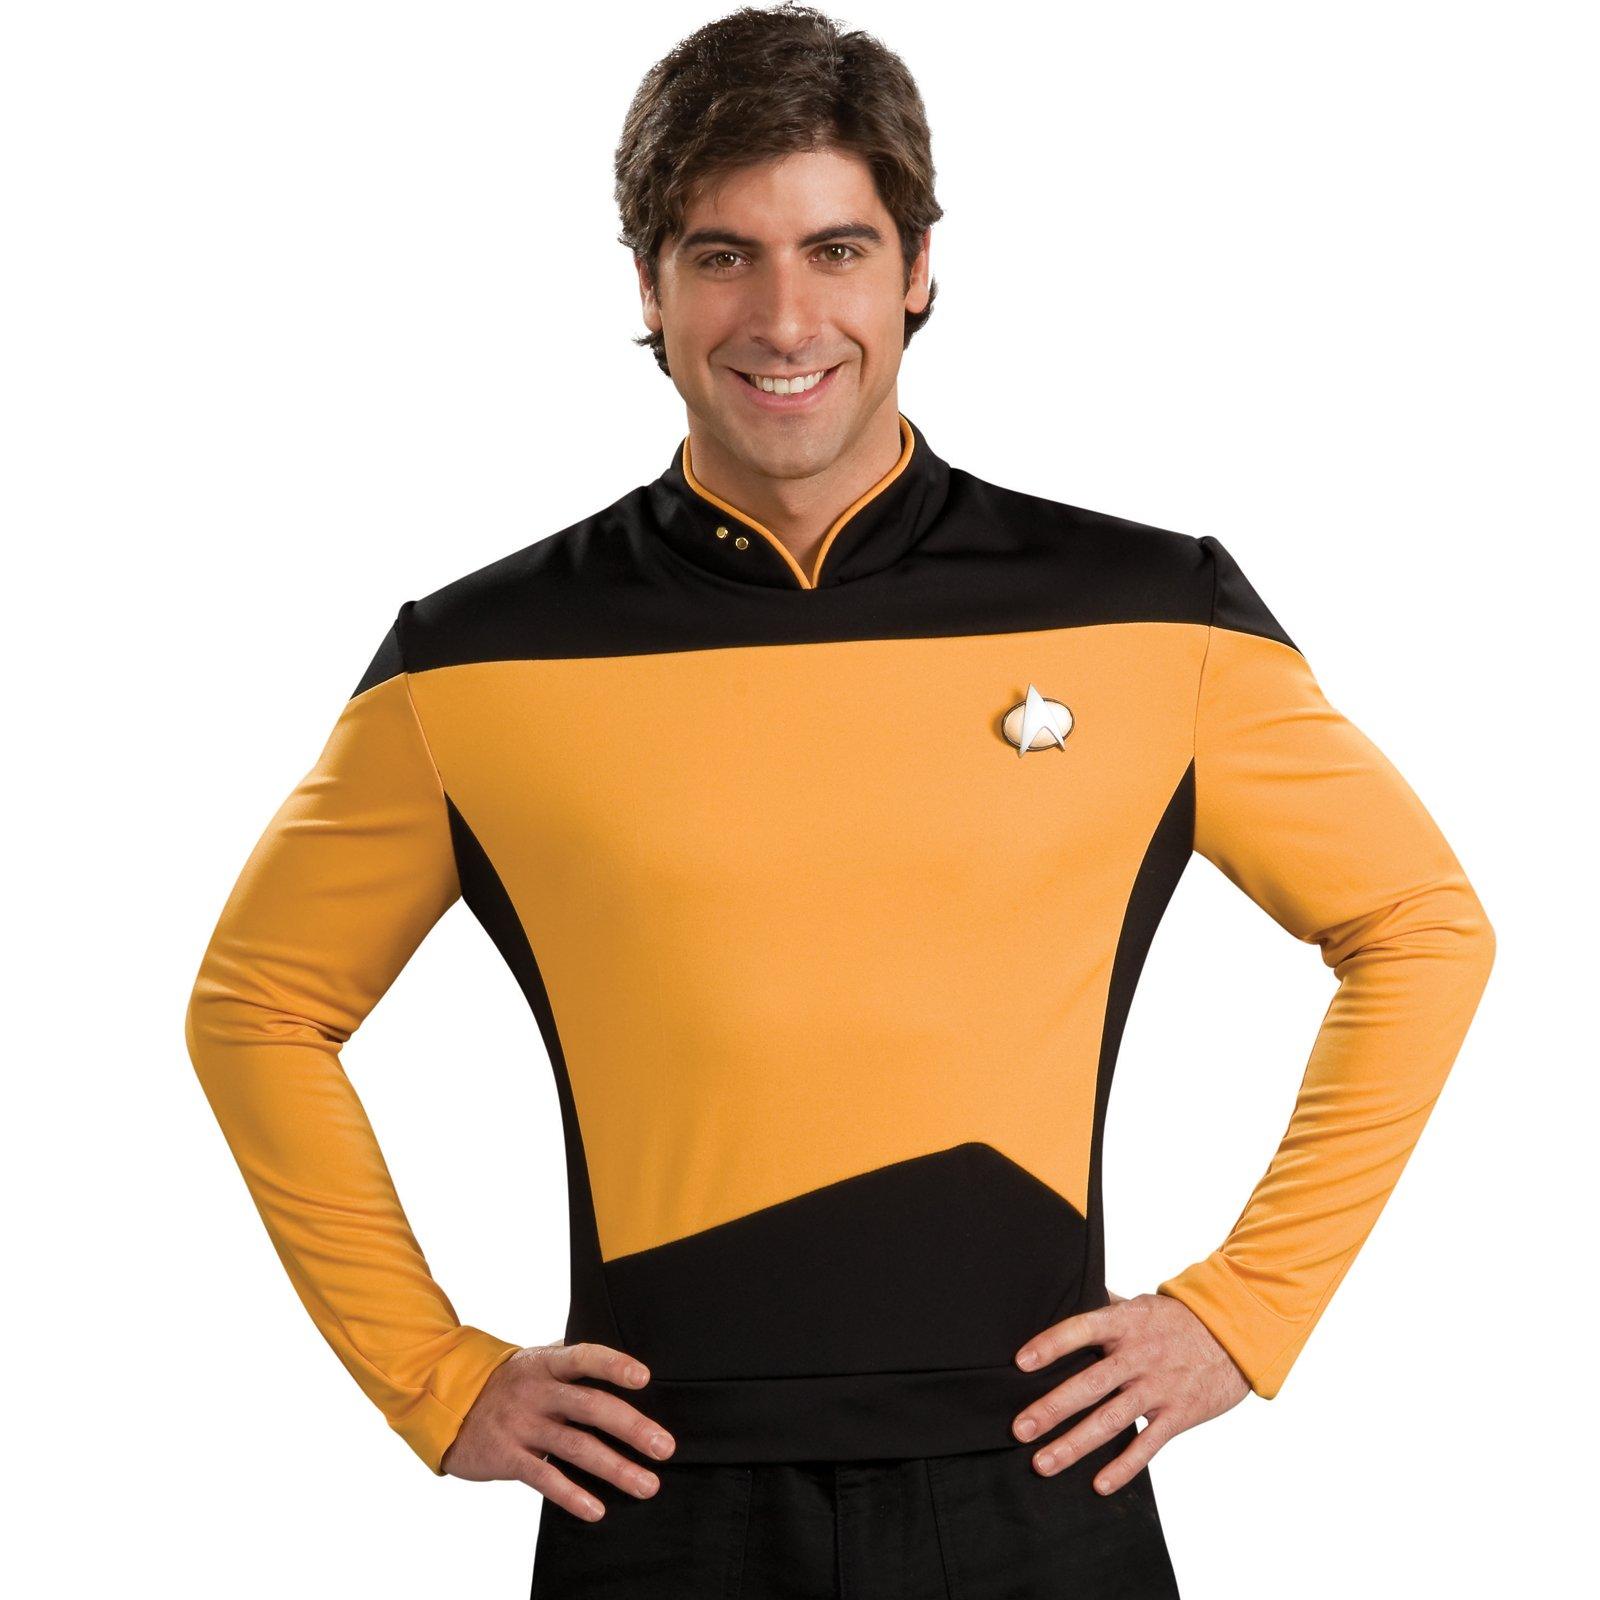 Star trek gold shirt kids costume